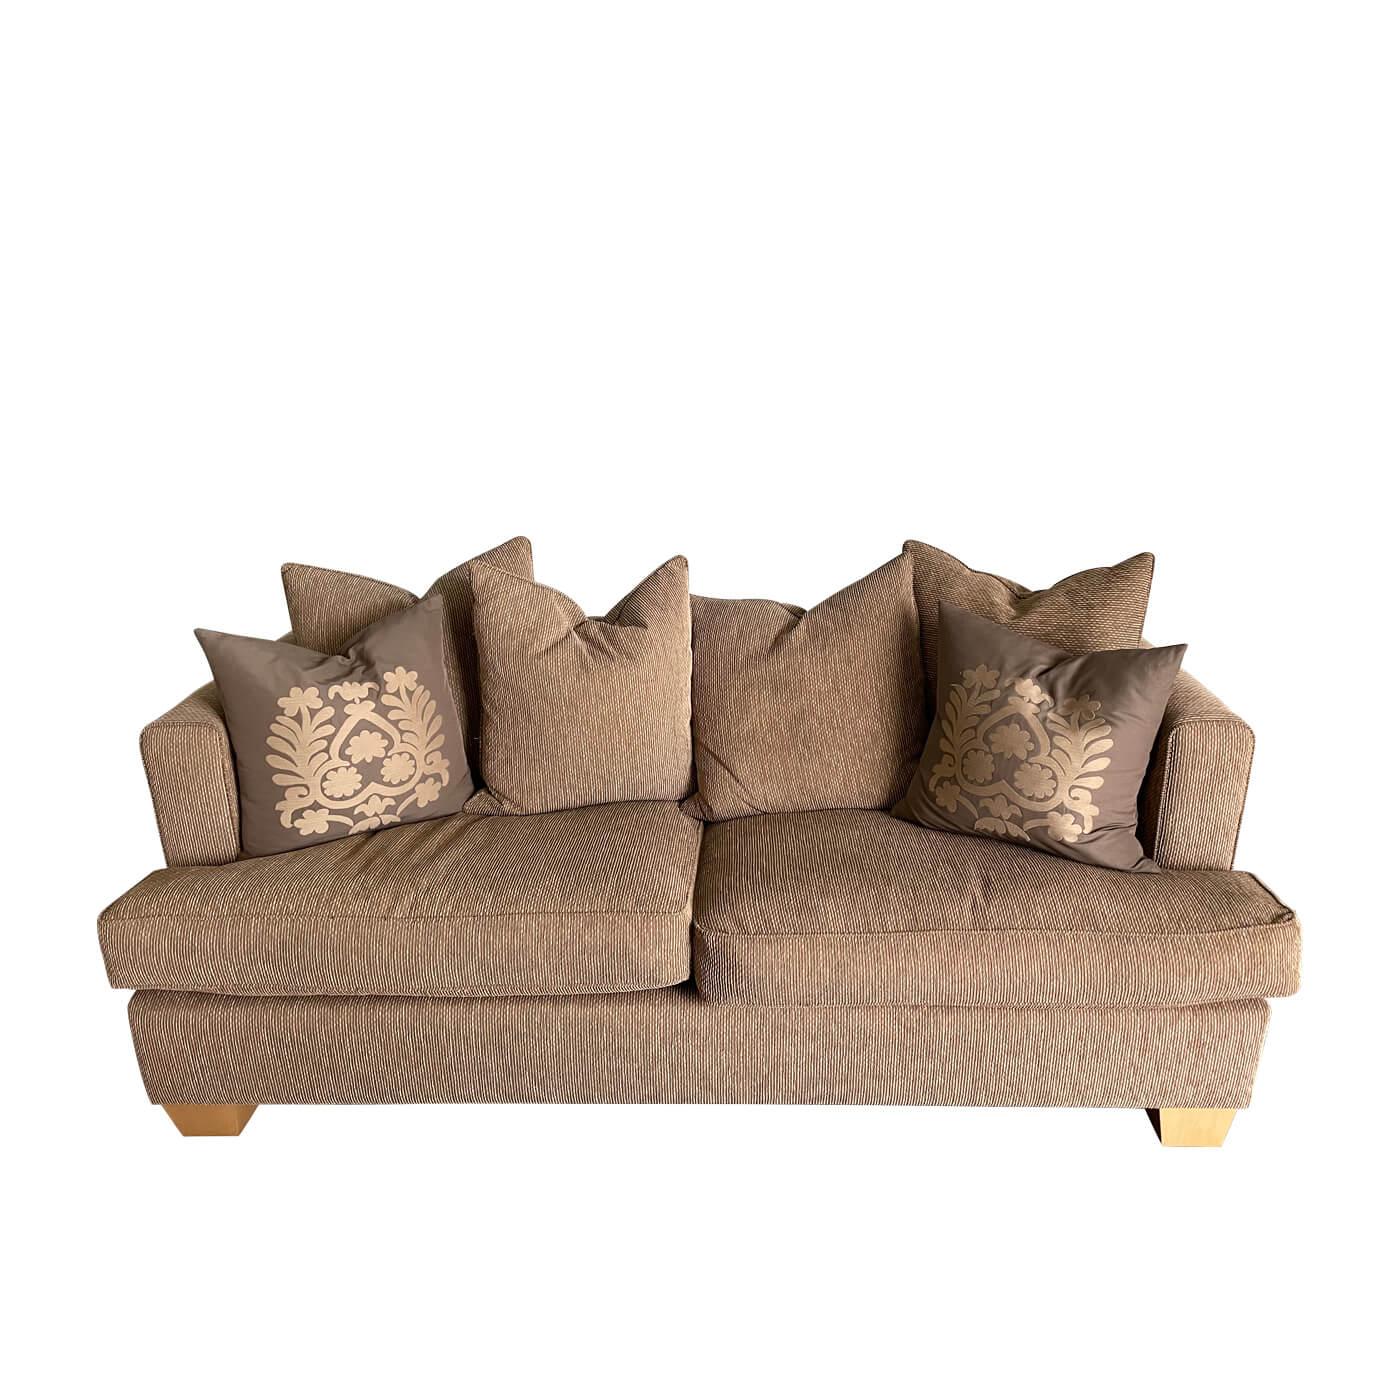 Custom 2.5 seater sofa with cushions